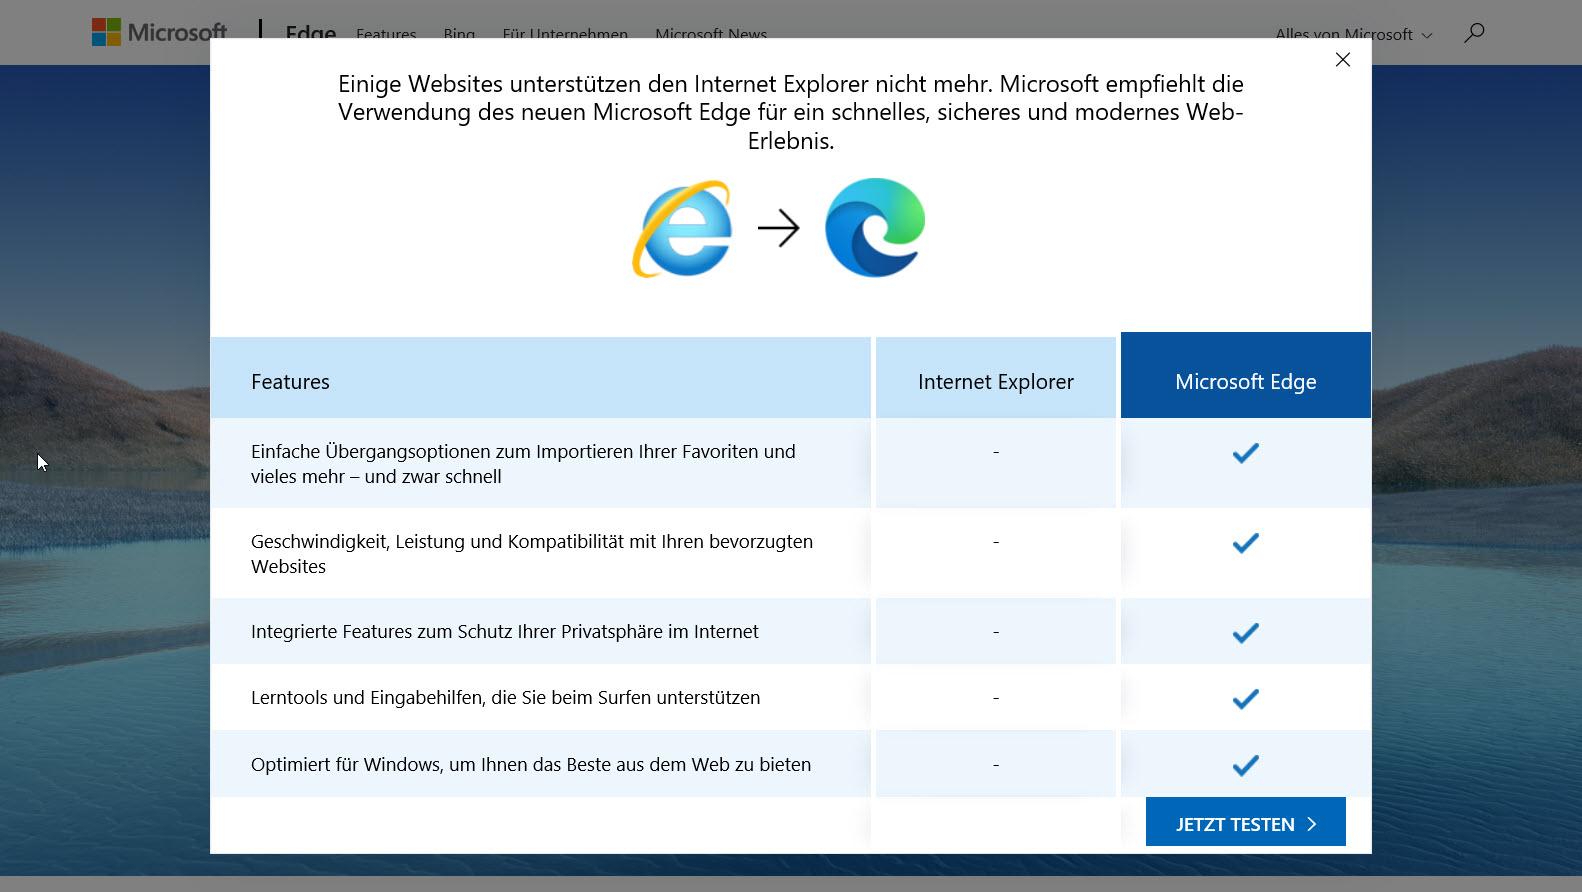 Hinweis auf den Internet Explorer in Microsoft Edge